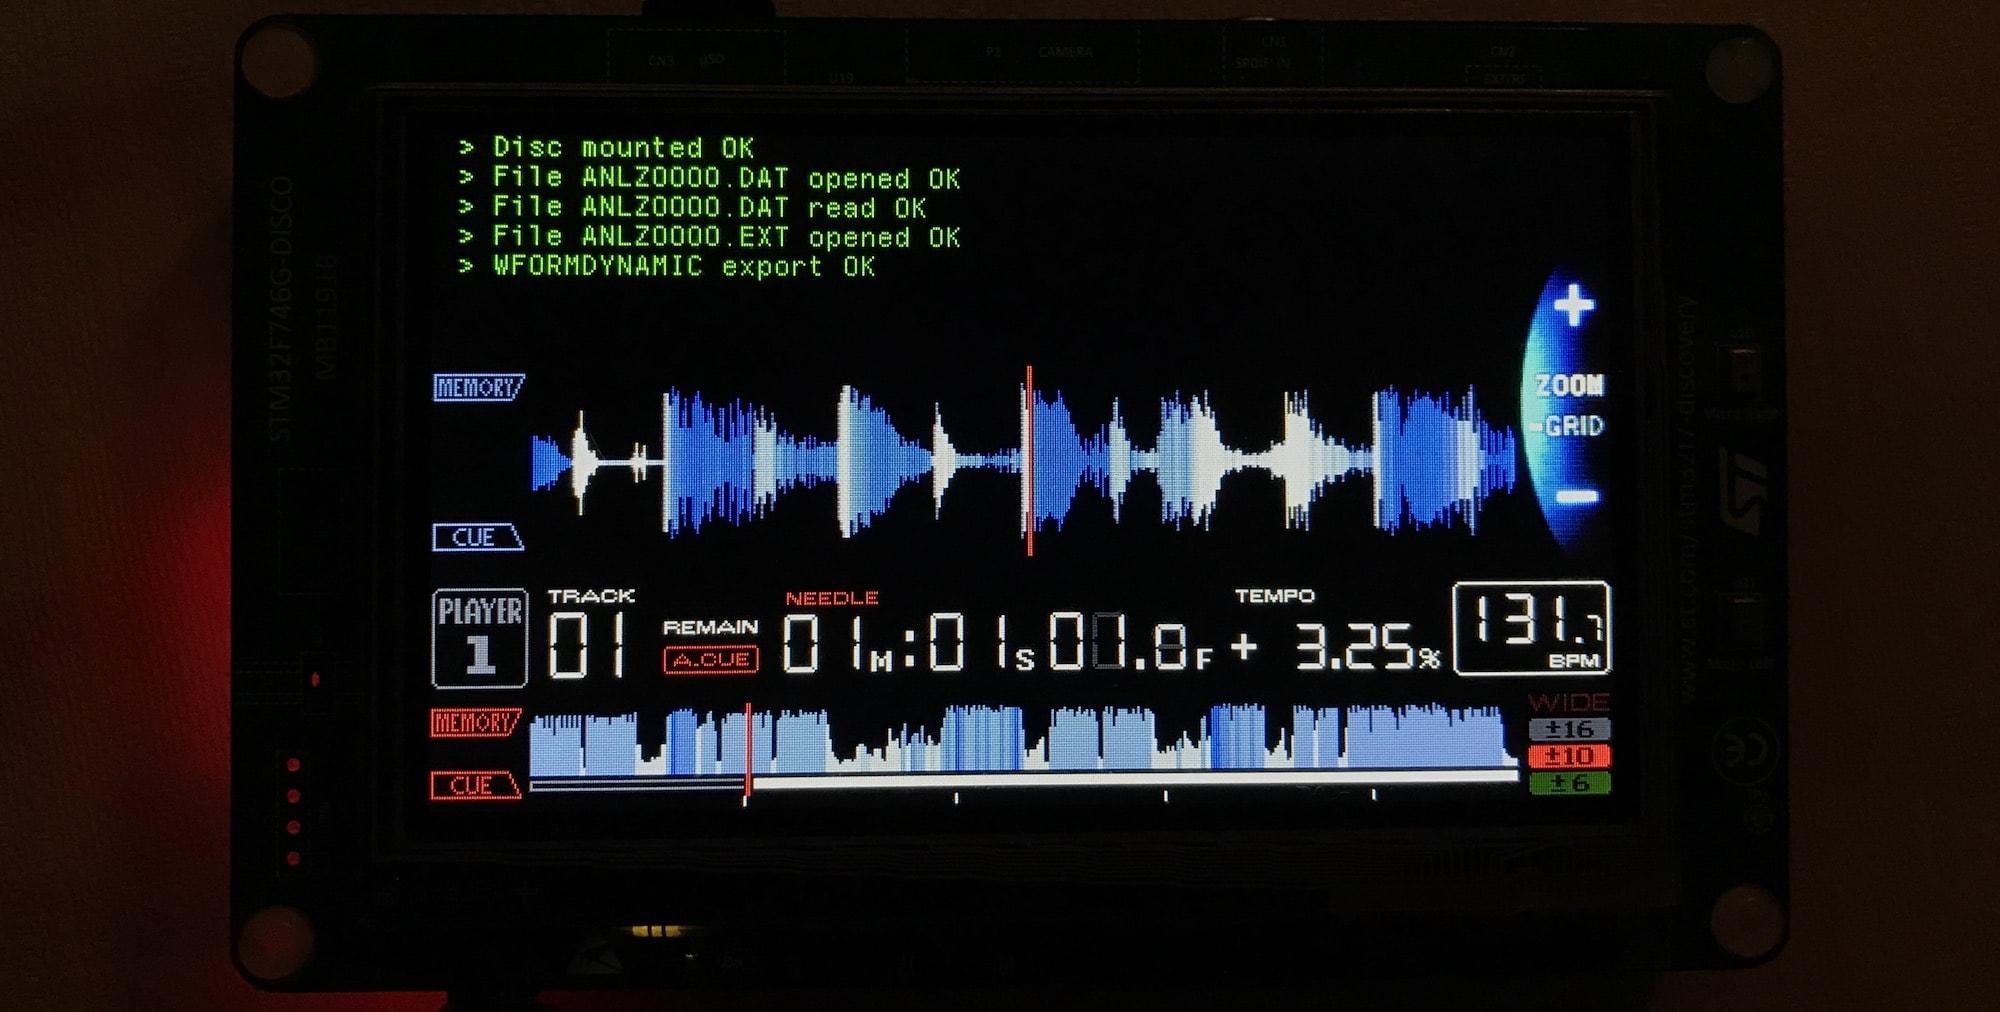 CDJ-1000mk3 Gets Amazing NXS-Style Display Mod - DJ TechTools